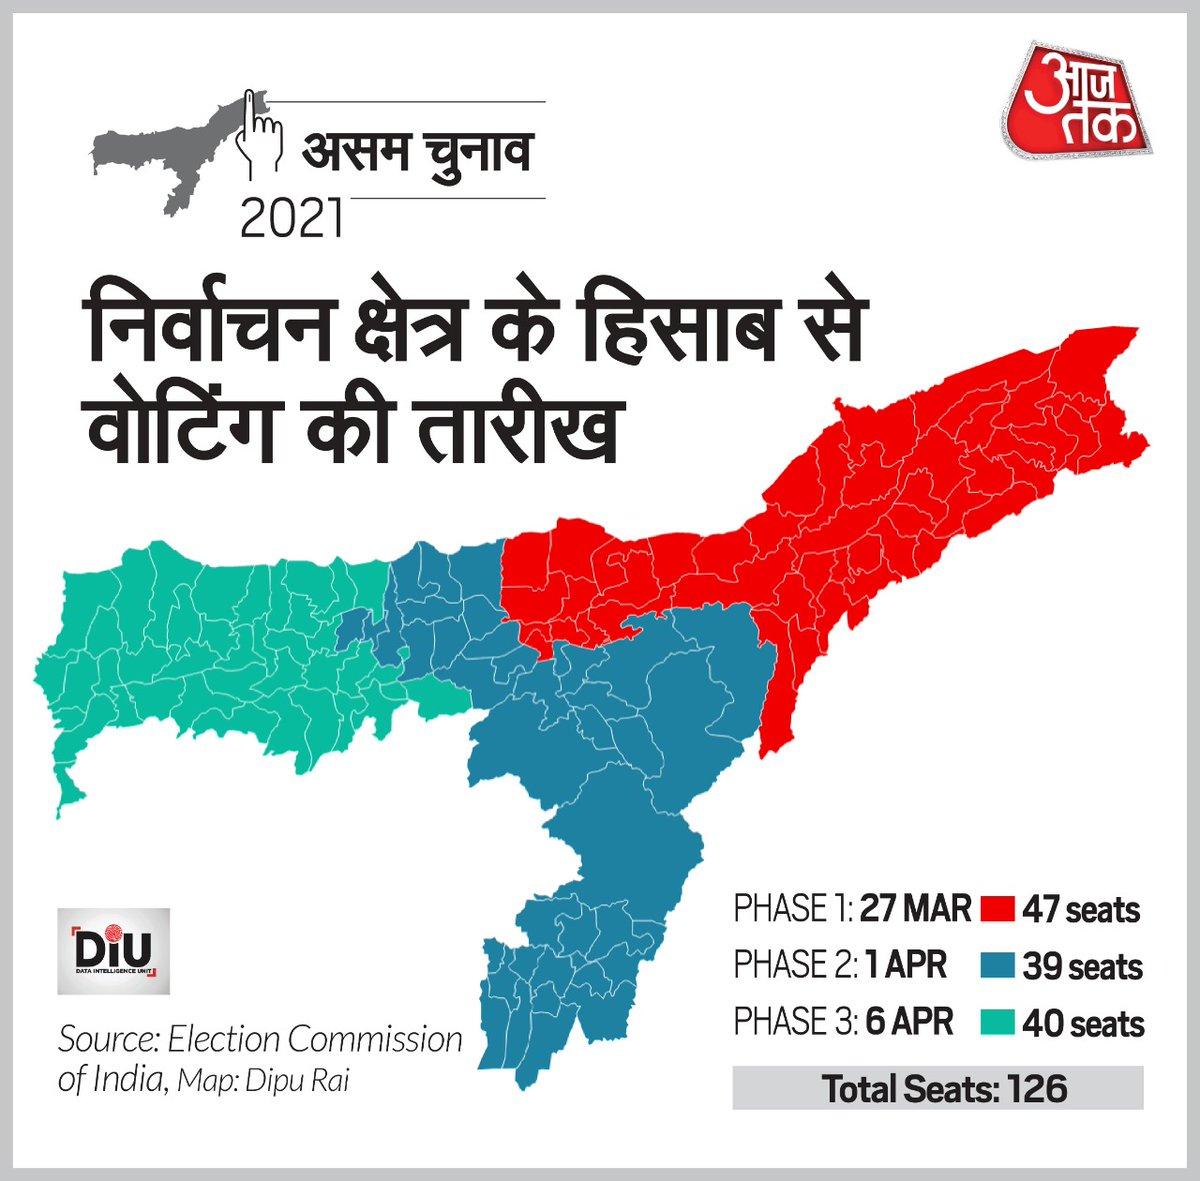 चुनाव आयोग ने आज असम विधान सभा चुनाव की तारीख घोषित कर दी. #AssamElections #AssemblyElection2021 #DIU